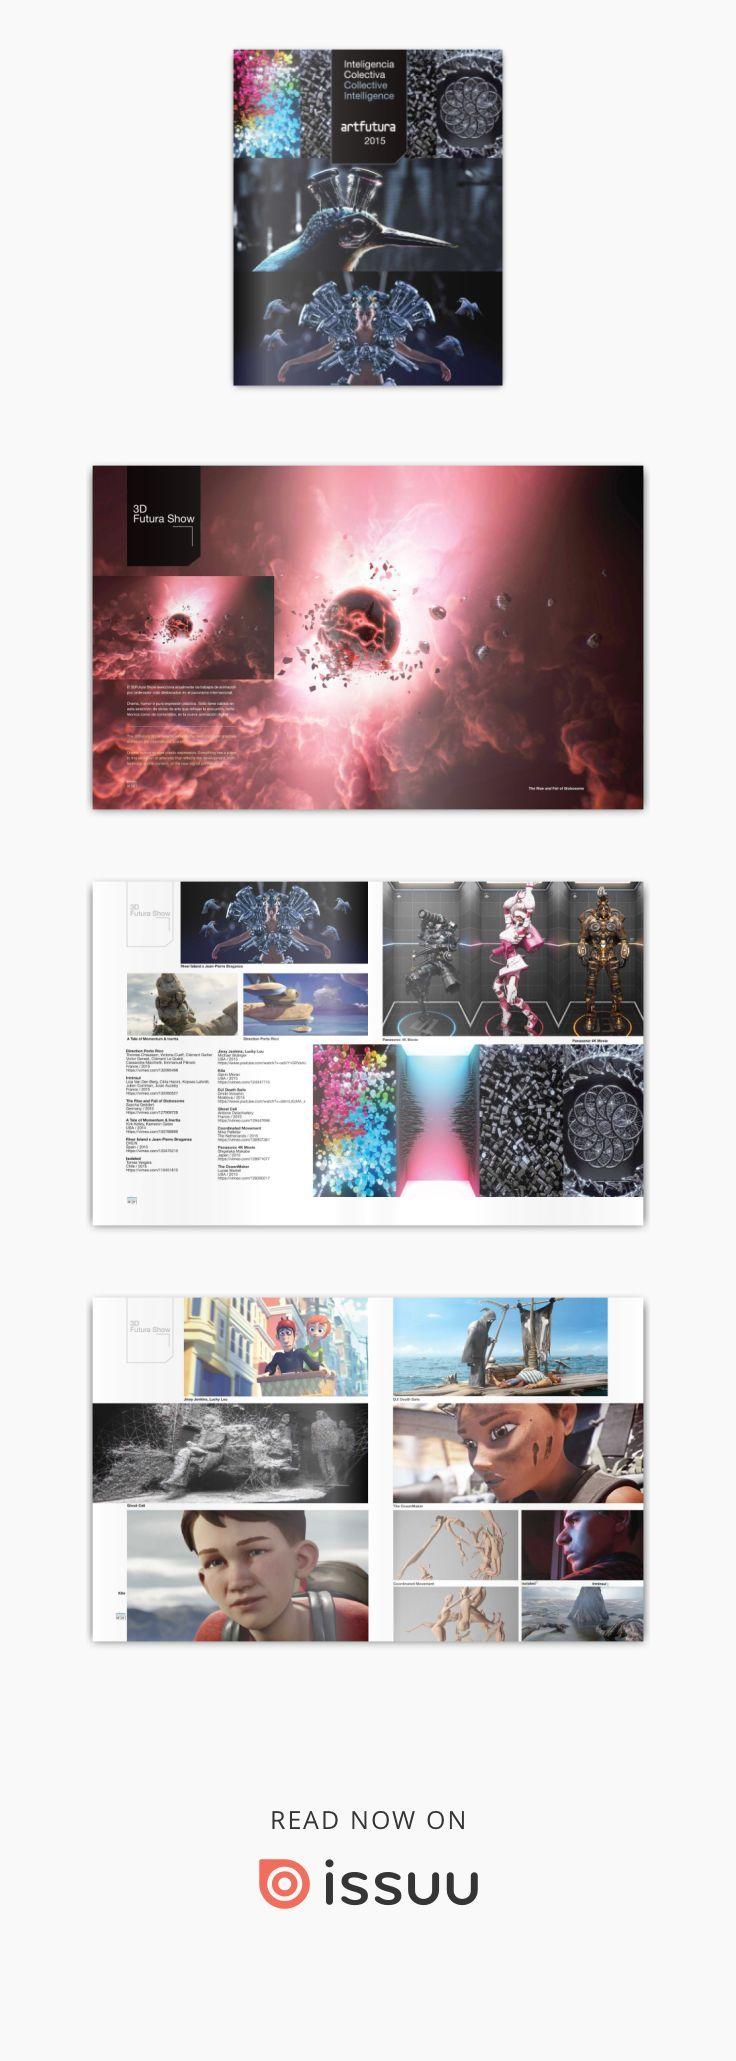 Artfutura 2015 - Collective Intelligence